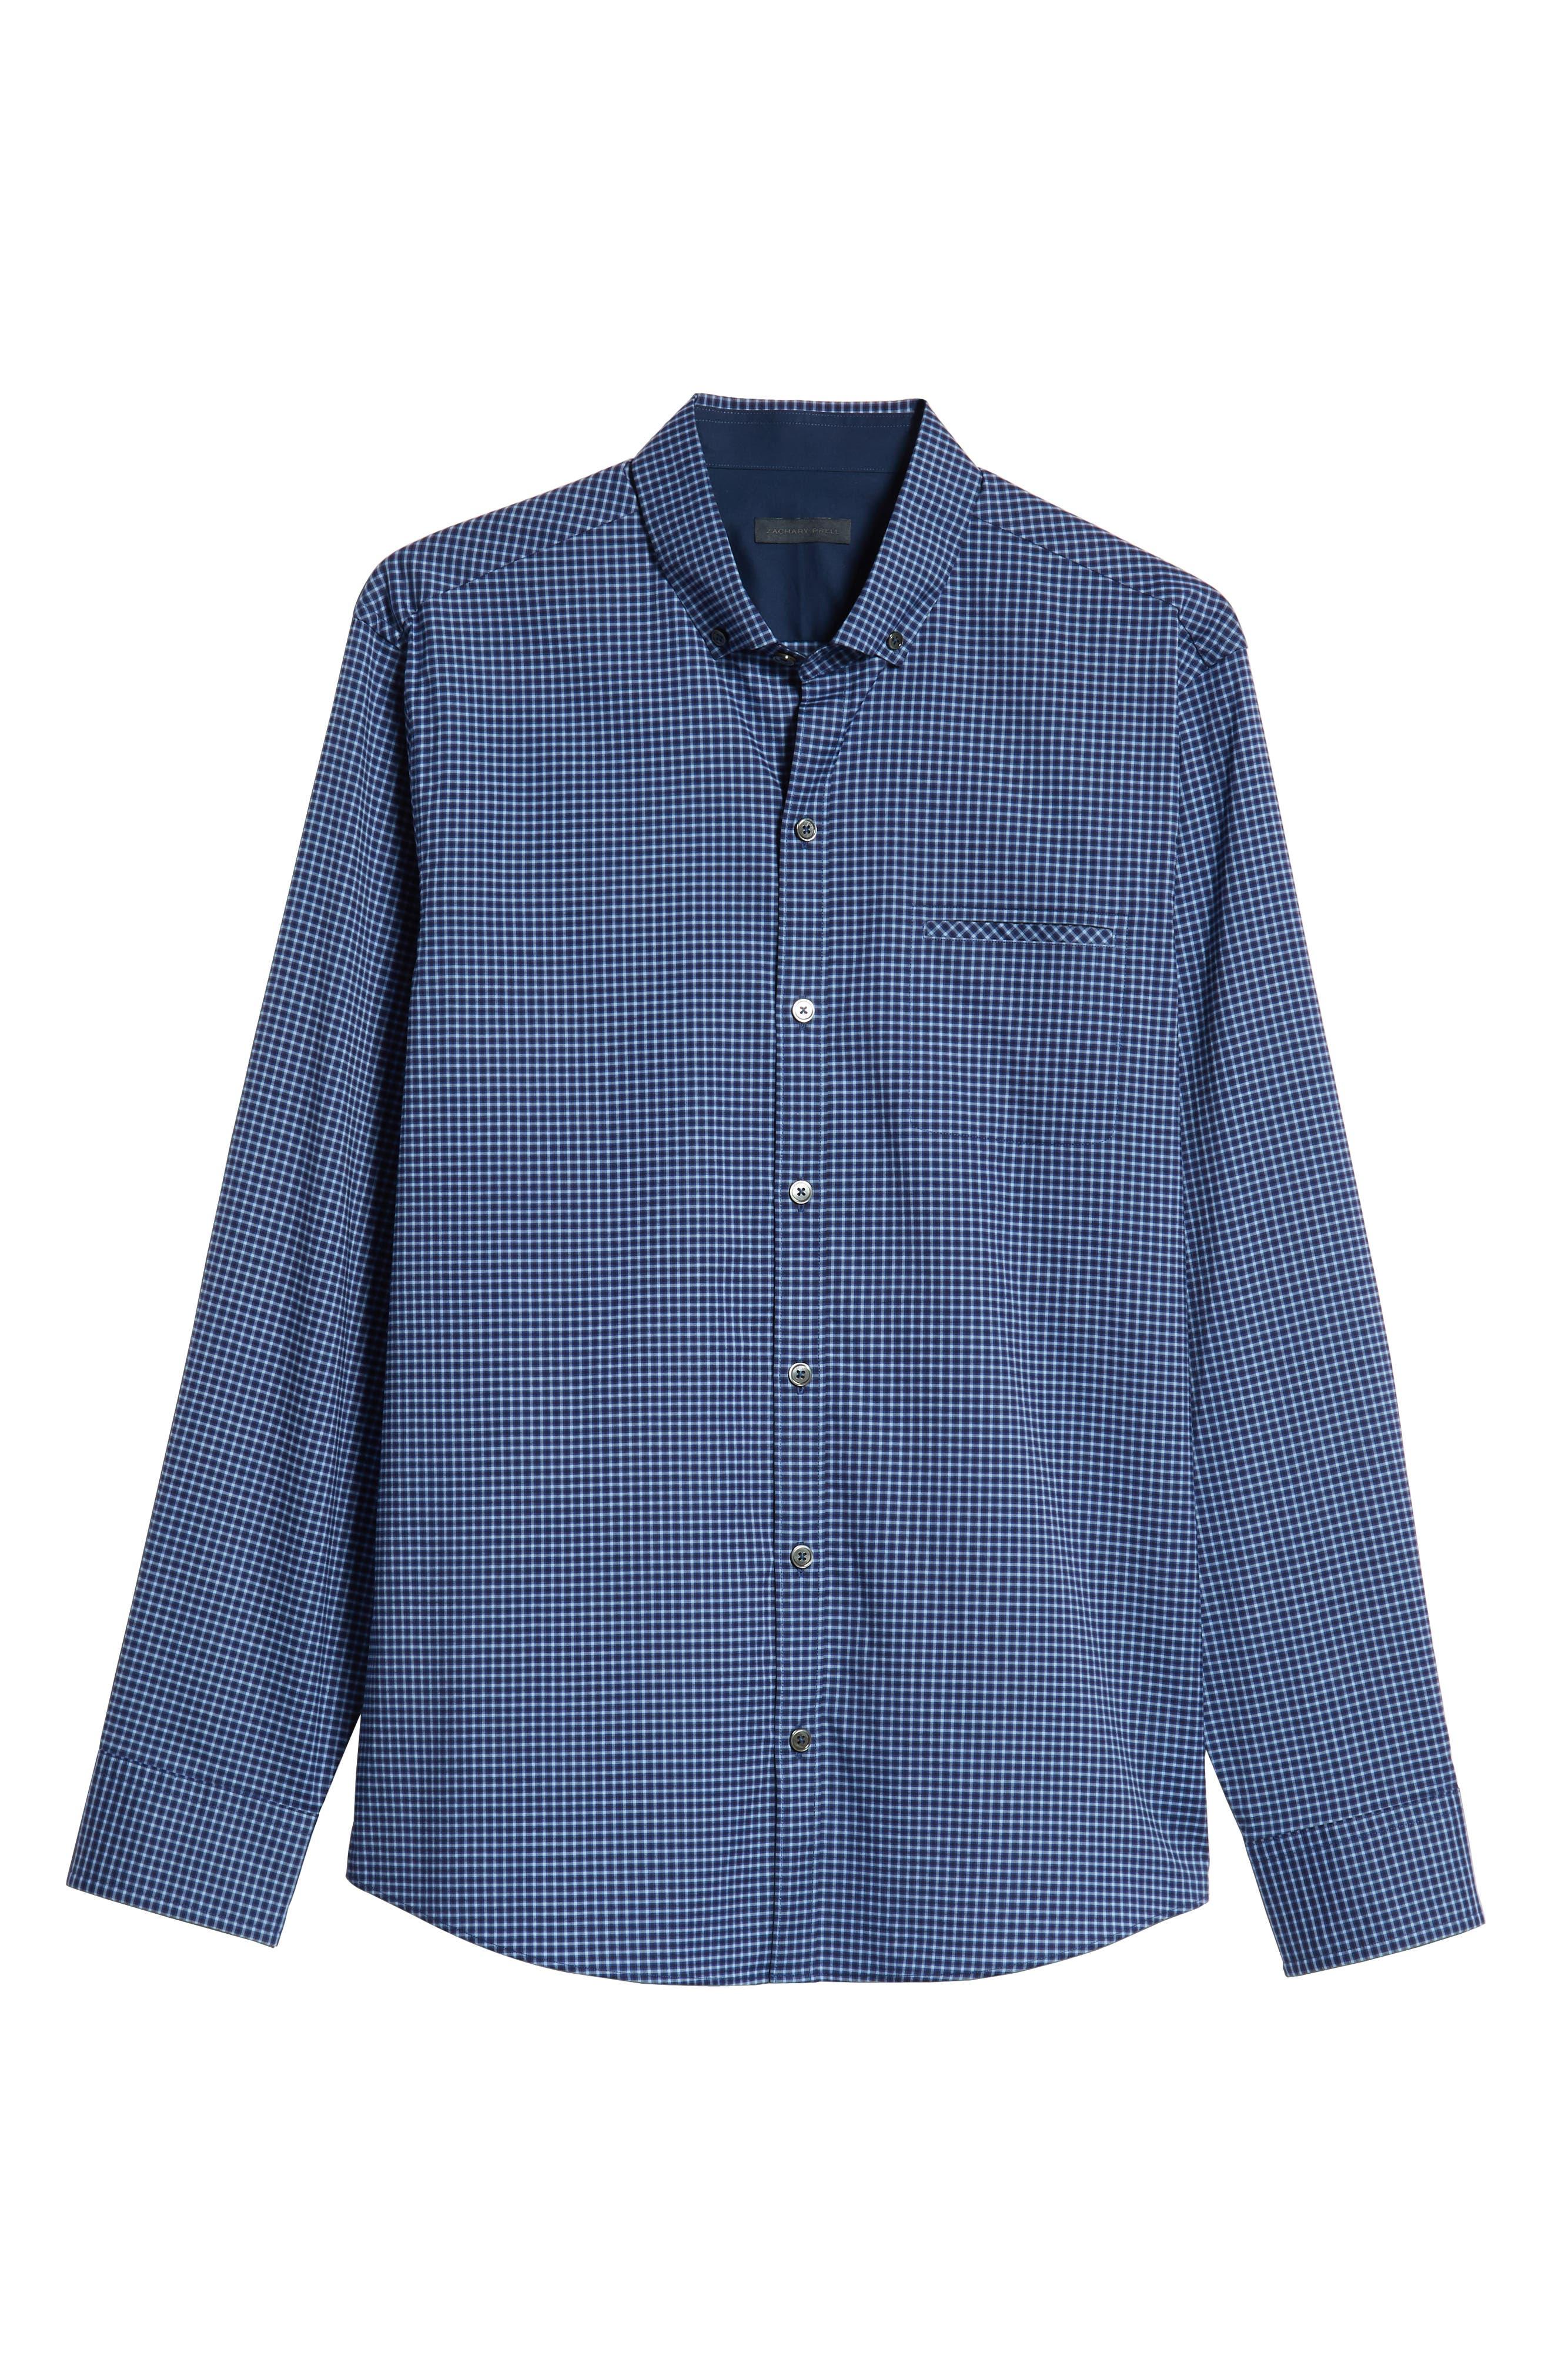 Matusiak Regular Fit Check Sport Shirt,                             Alternate thumbnail 5, color,                             MIDNIGHT